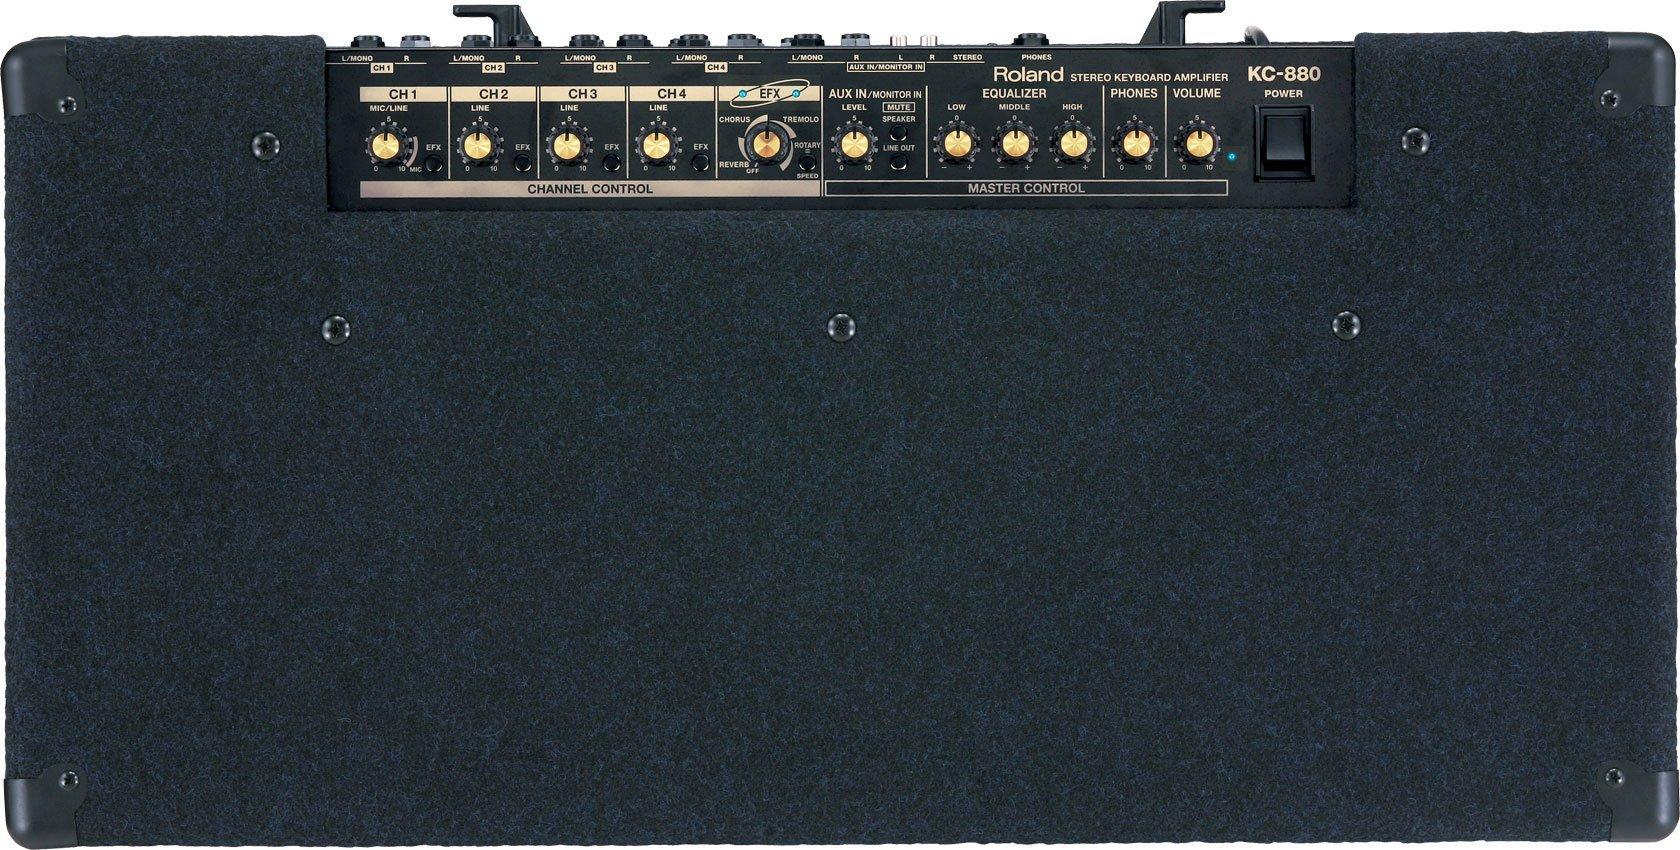 Roland KC-880 Stereo Keyboard Amplifier